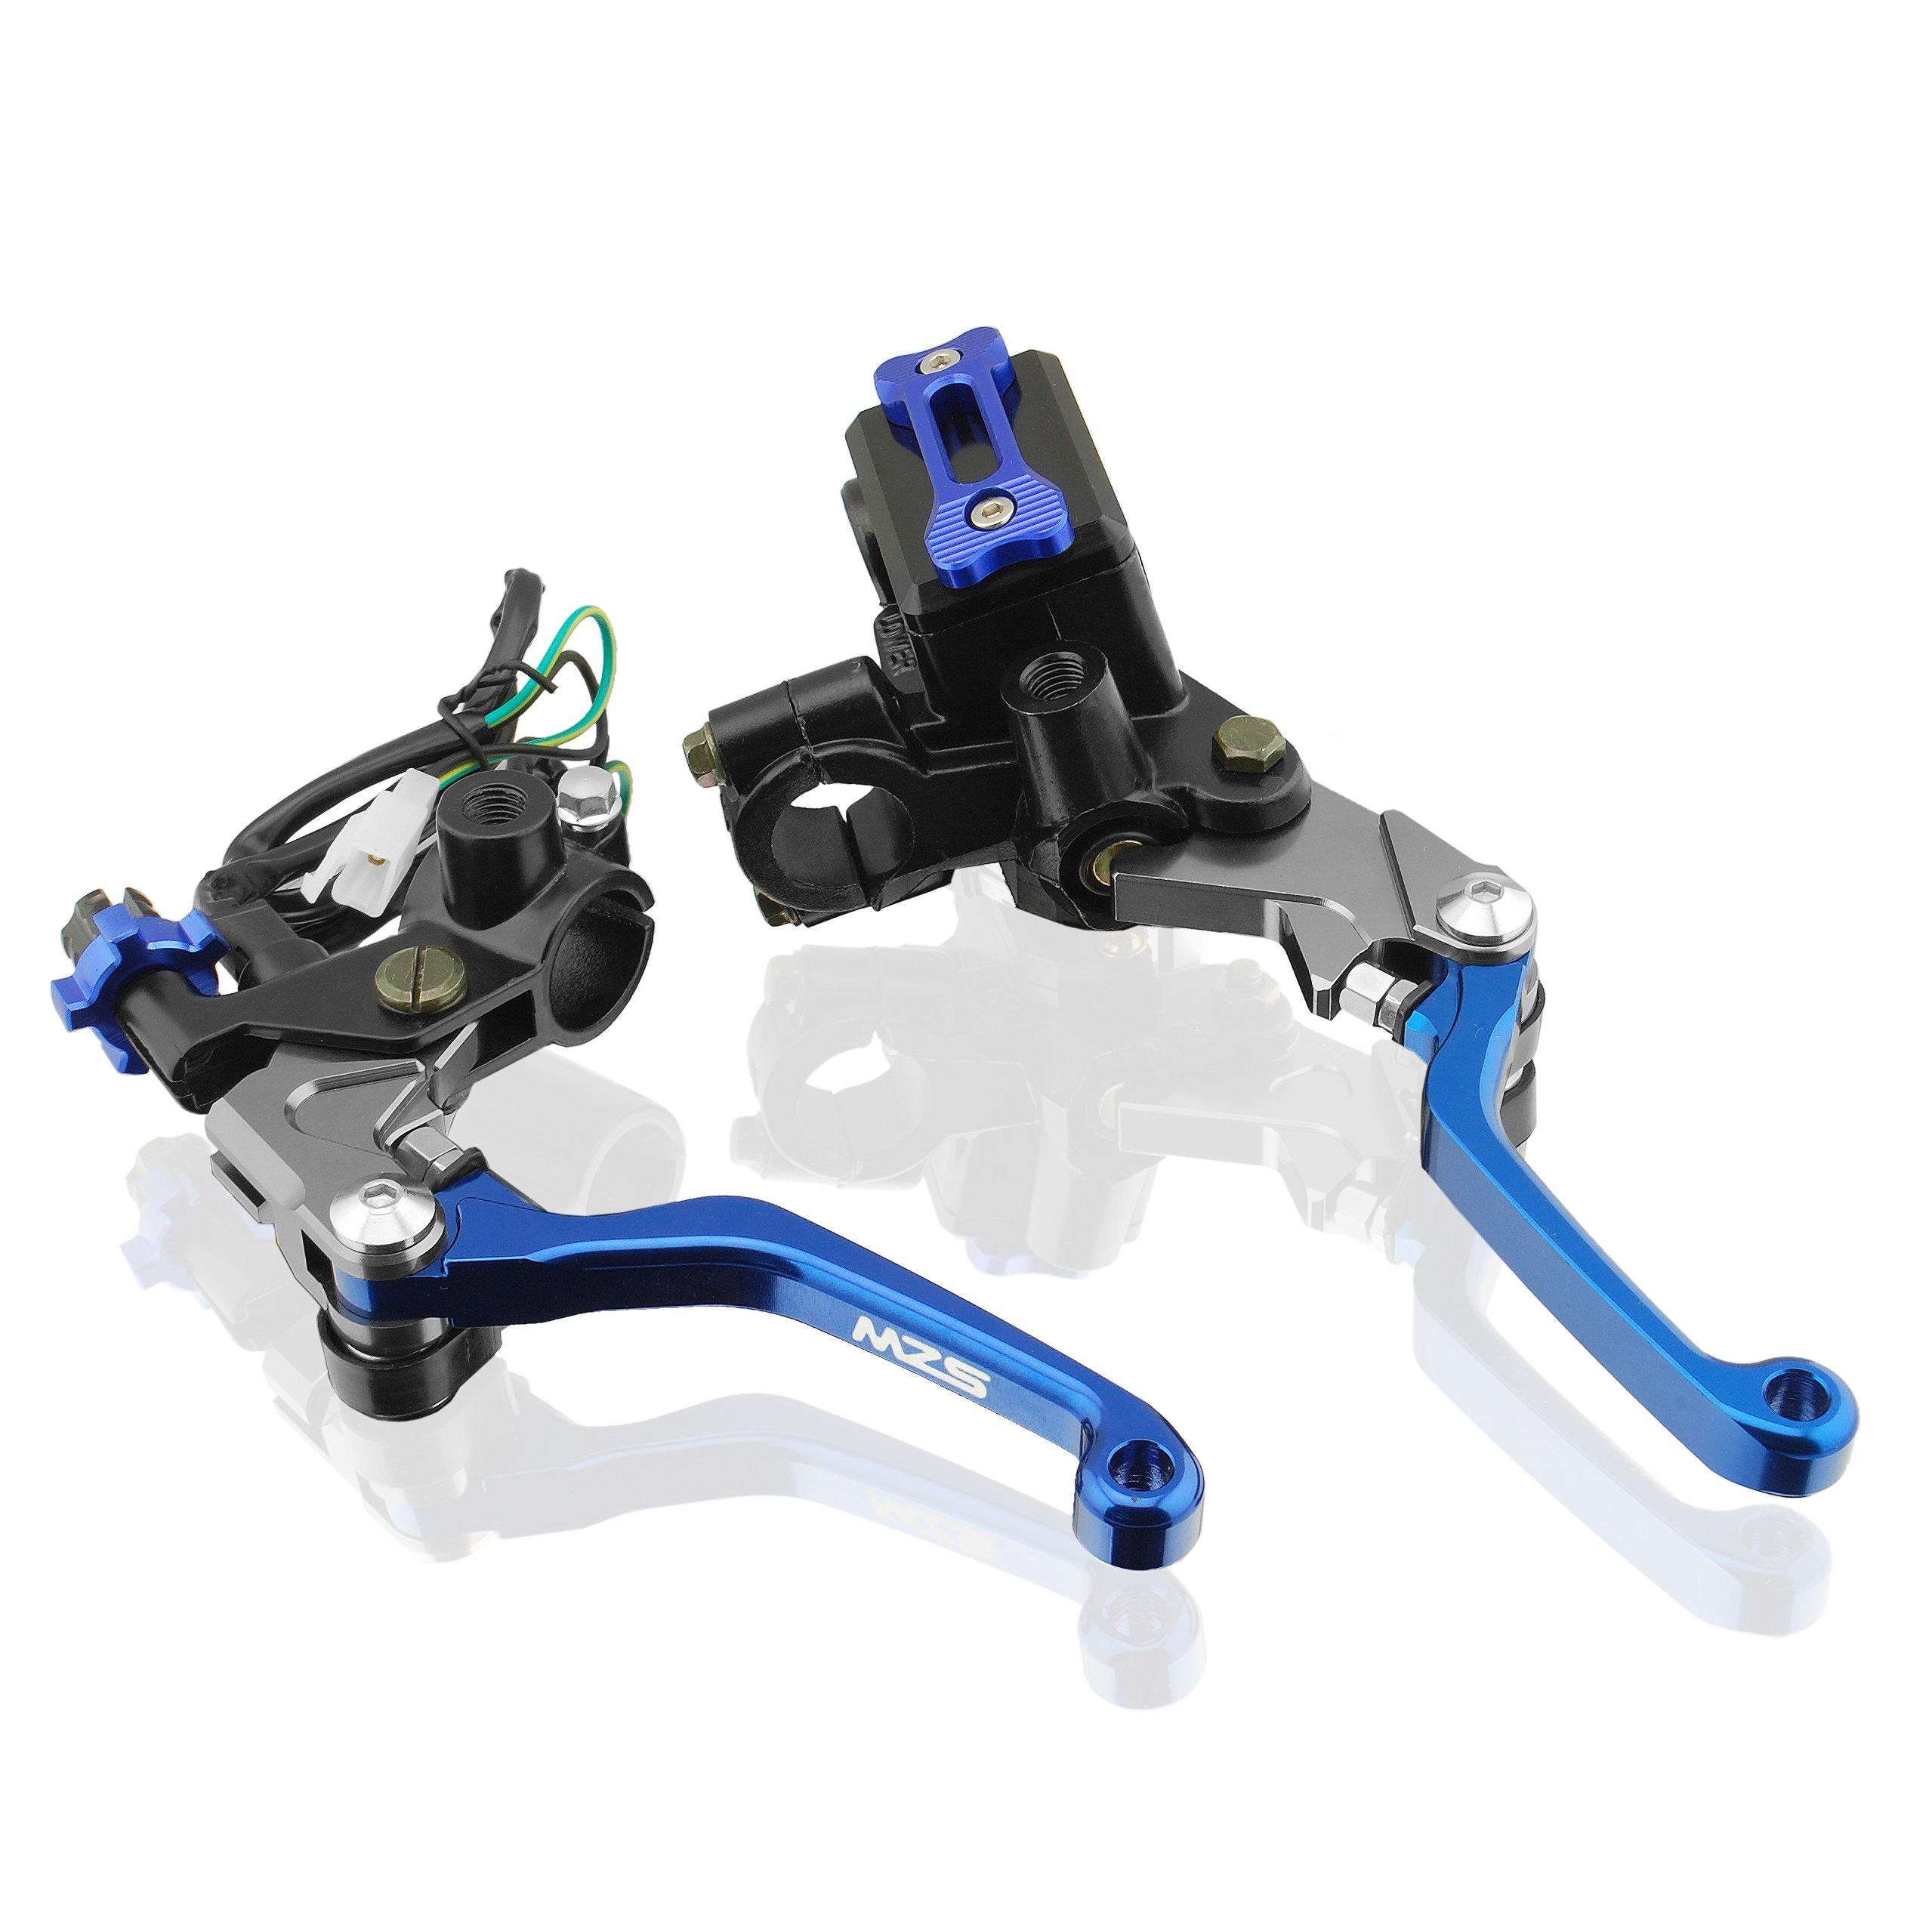 MZS 7/8'' Brake Master Cylinder Reservoir Pivot Levers for Honda Yamaha Suzuki Kawasaki KTM and more Blue